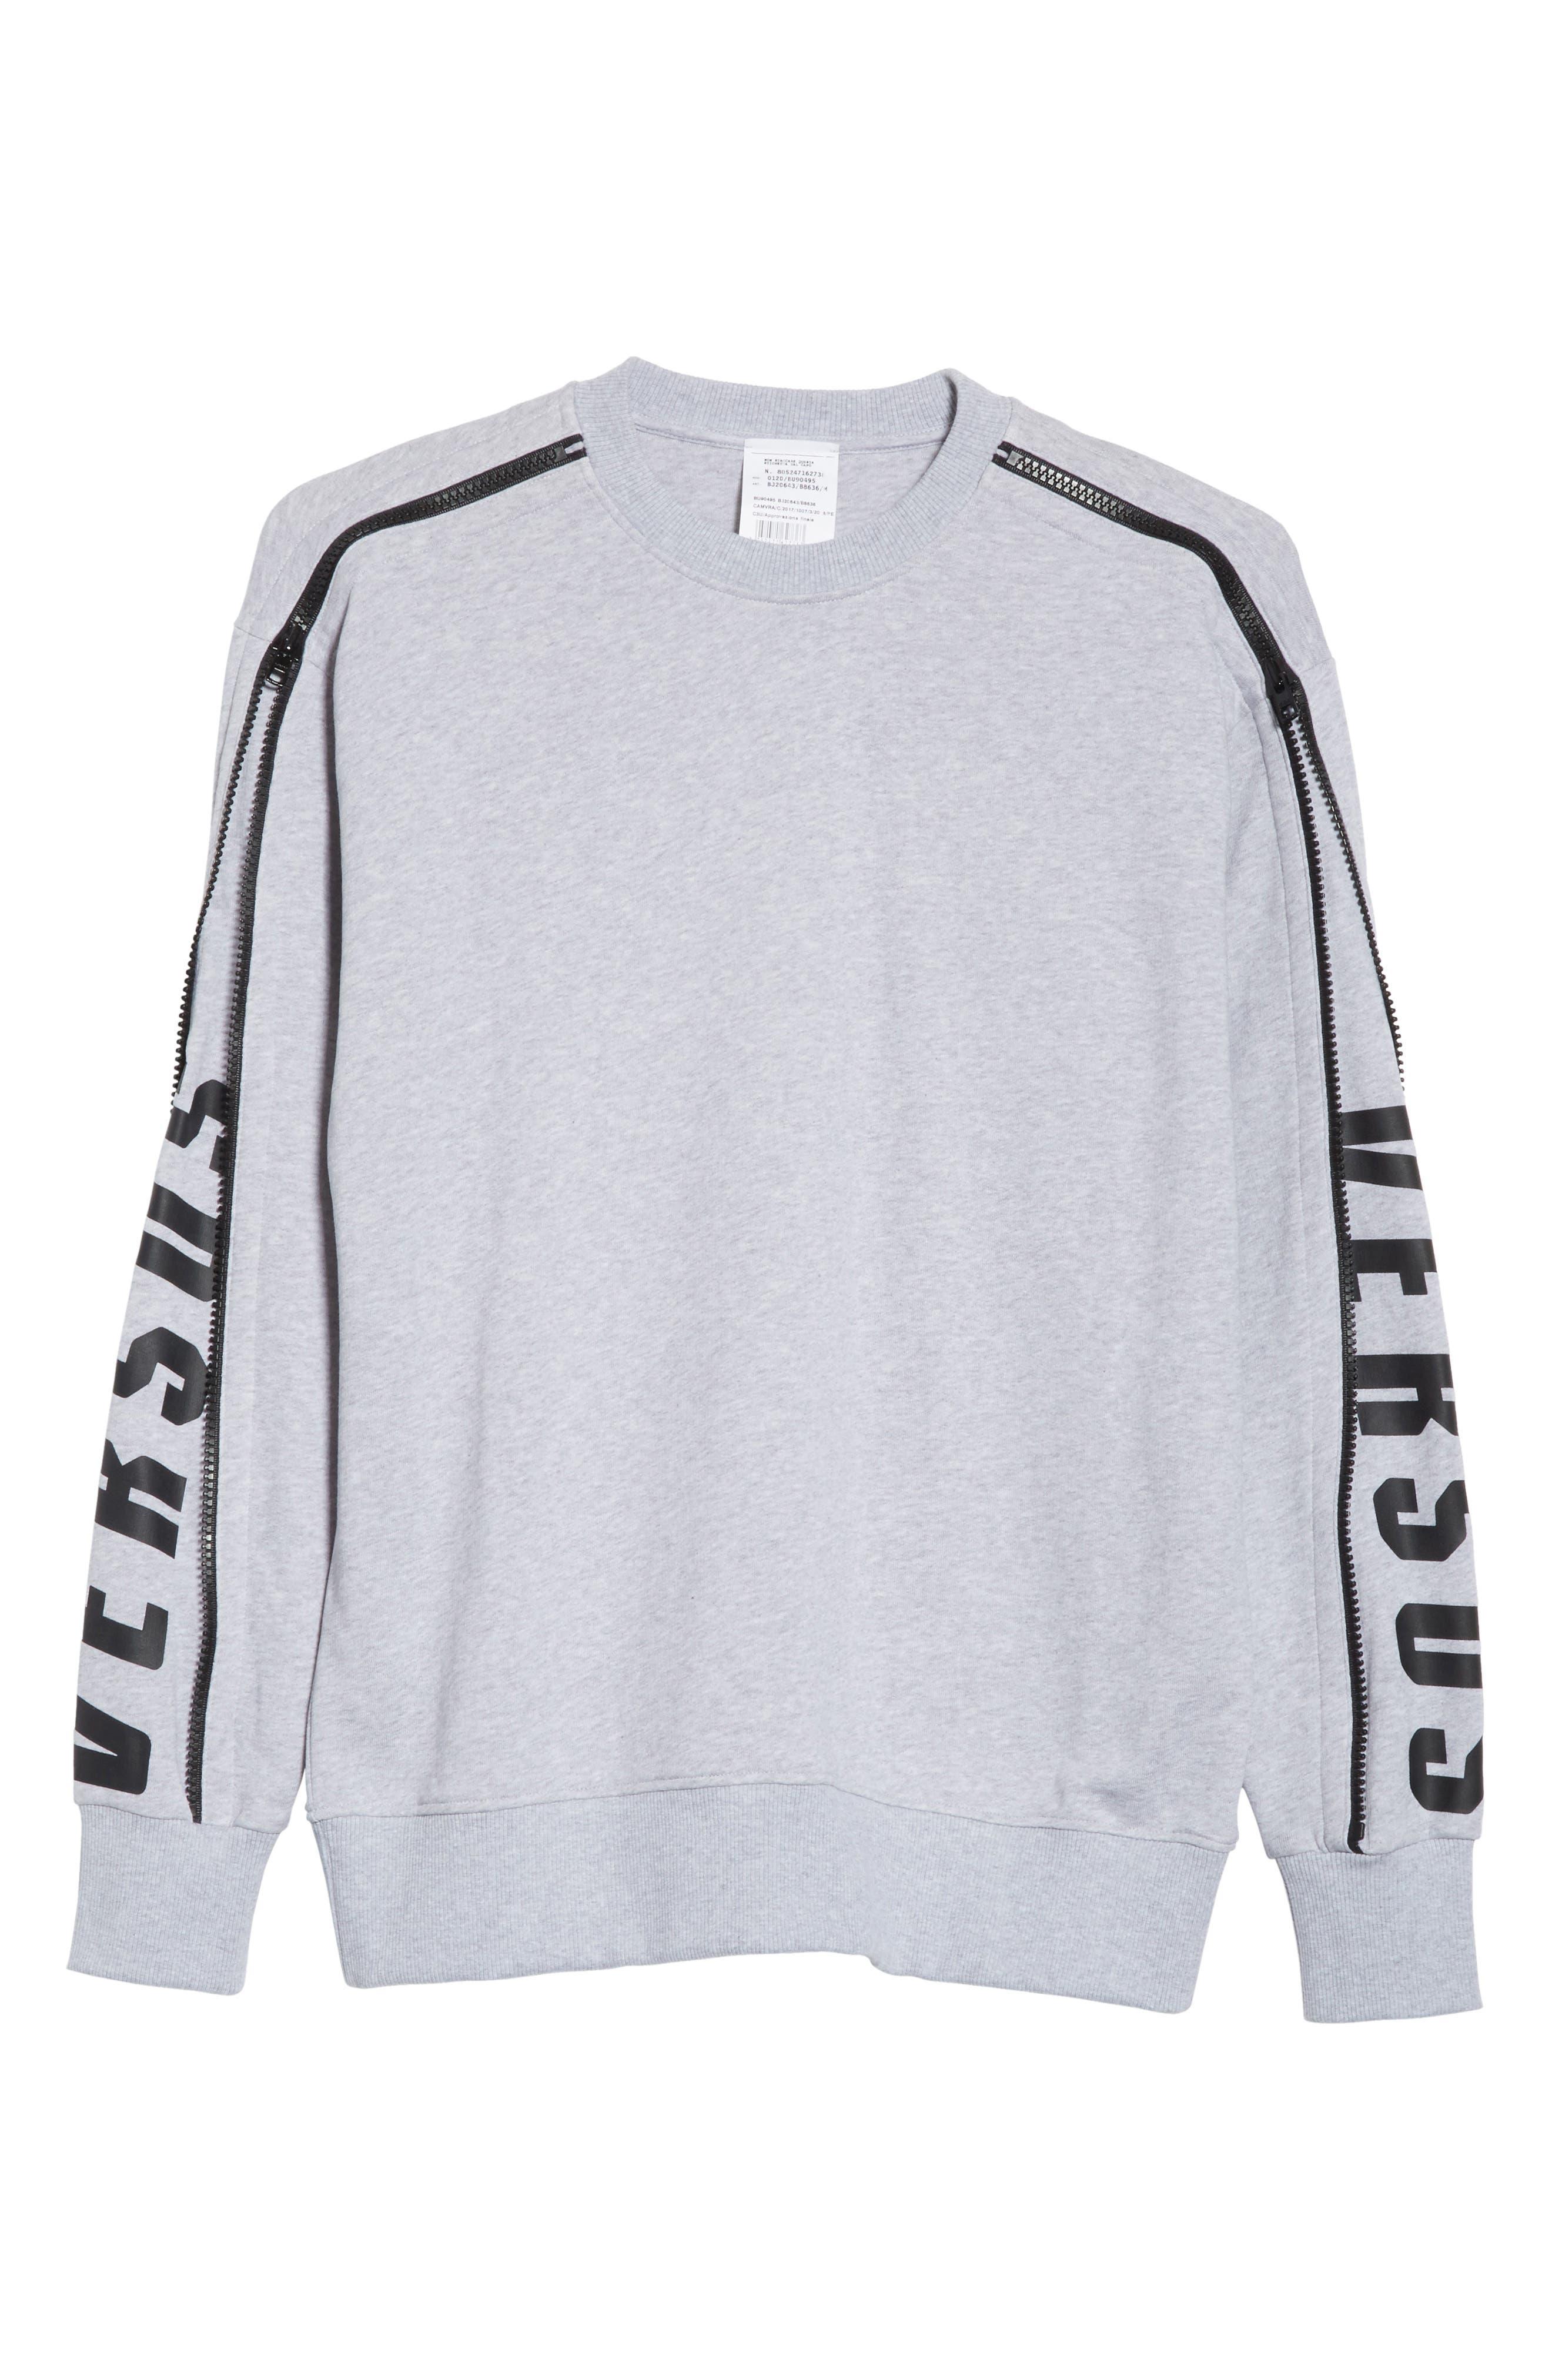 VERSUS by Versace Zip Sleeve Crewneck Sweatshirt,                             Alternate thumbnail 6, color,                             Grey